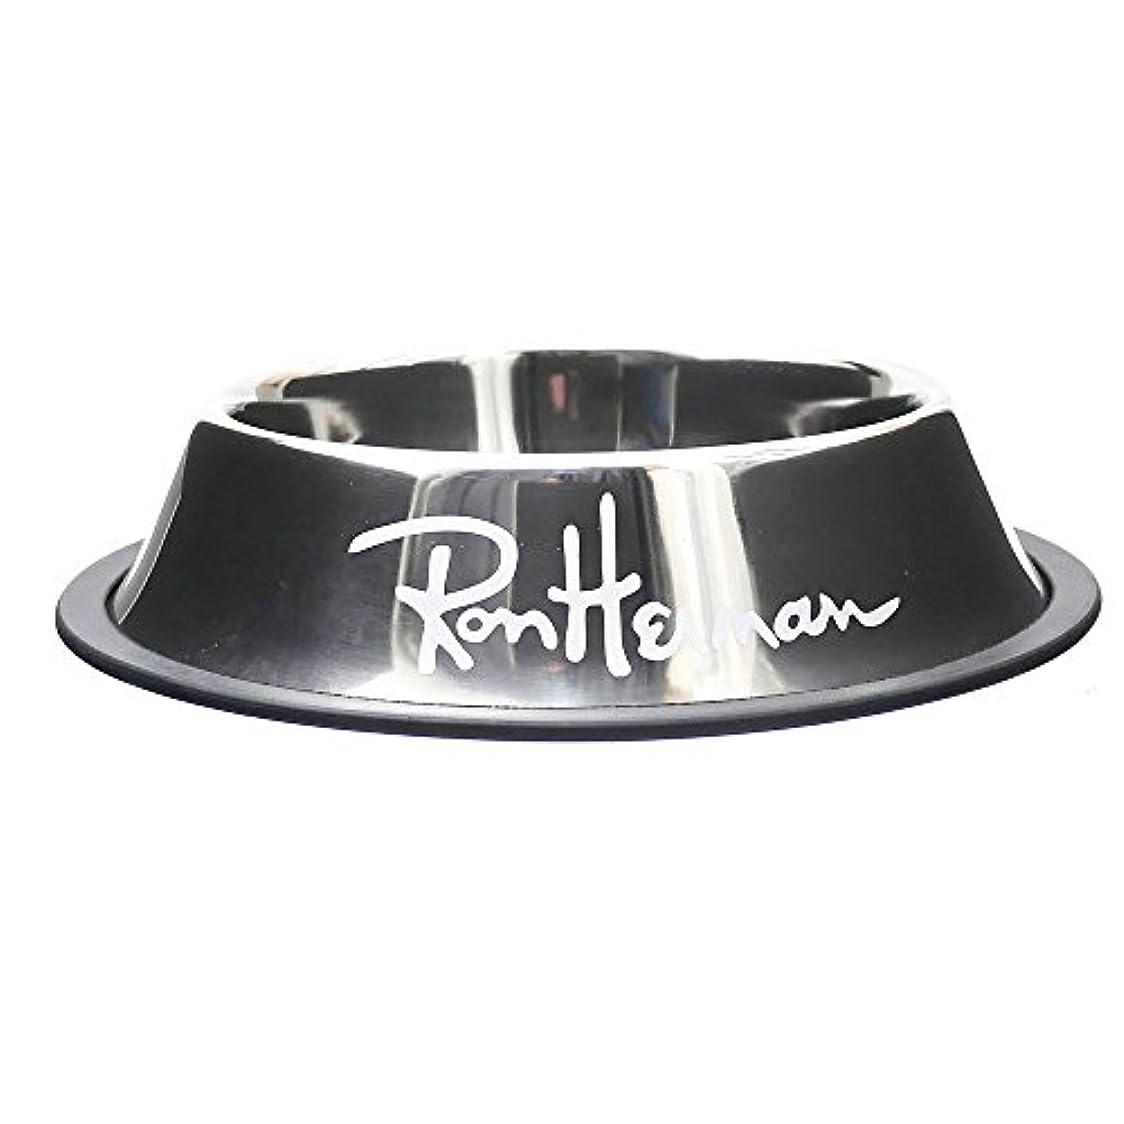 Ron Herman(ロンハーマン) DOG BOWL M (ドッグボウル) SILVERxWHITE 290-004596-042 【新品】 [並行輸入品]